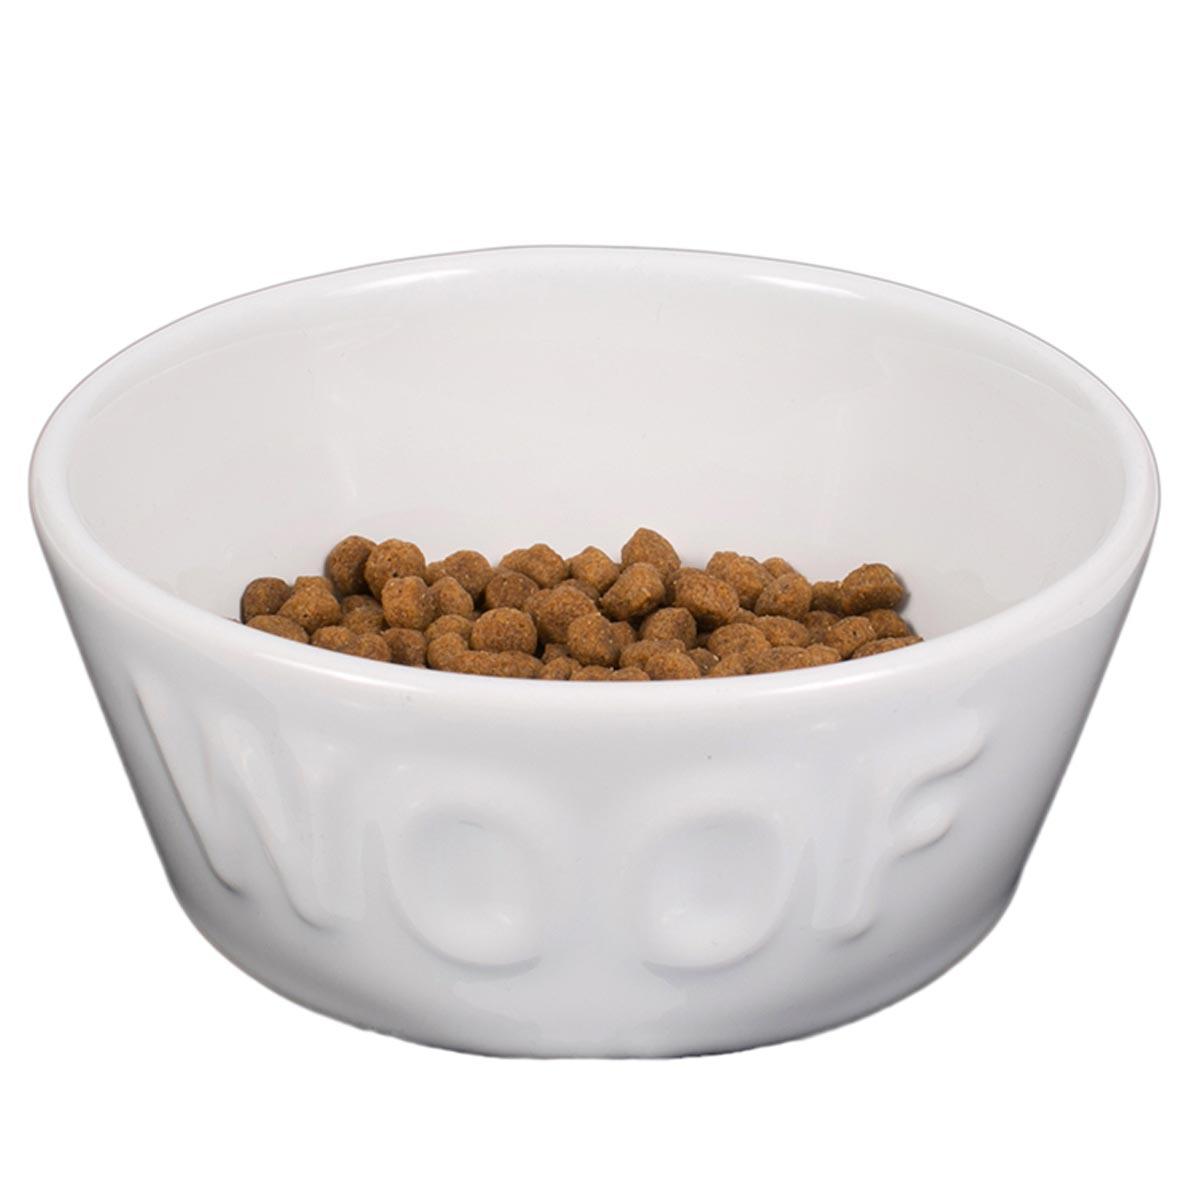 Comedouro Woof para Cachorro e Gato Esmaltado Branco